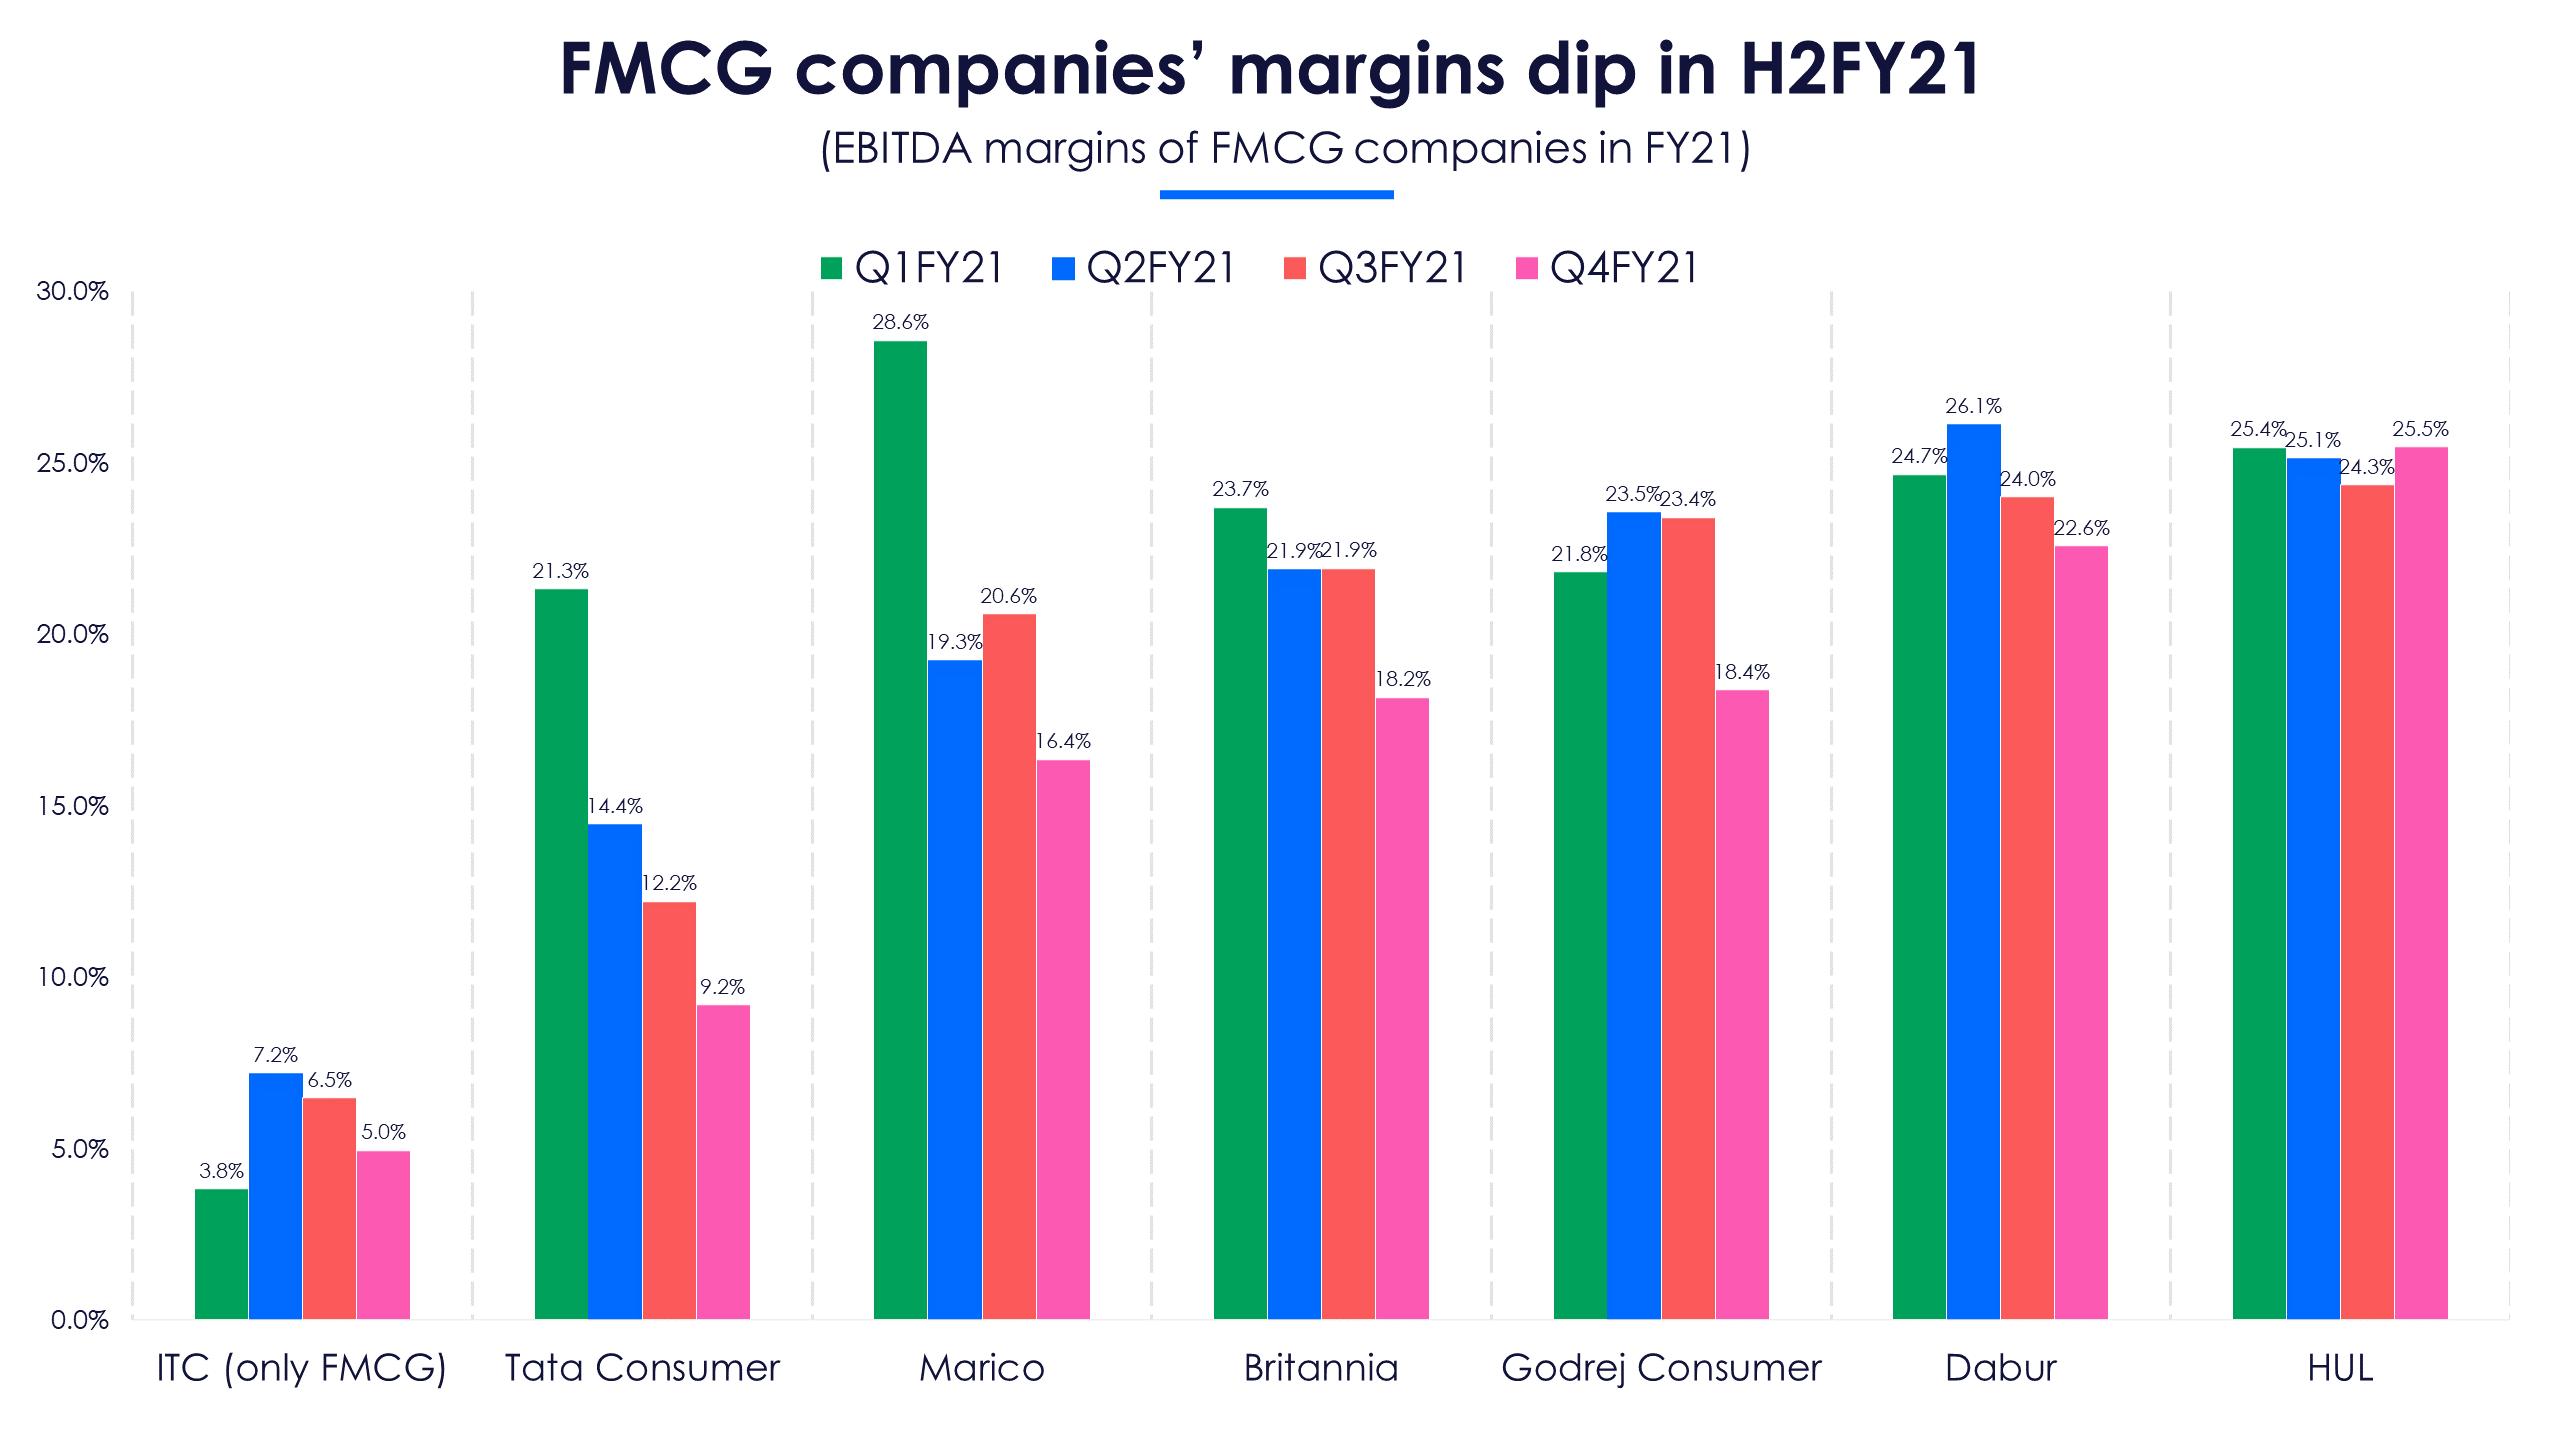 FMCG companies margins